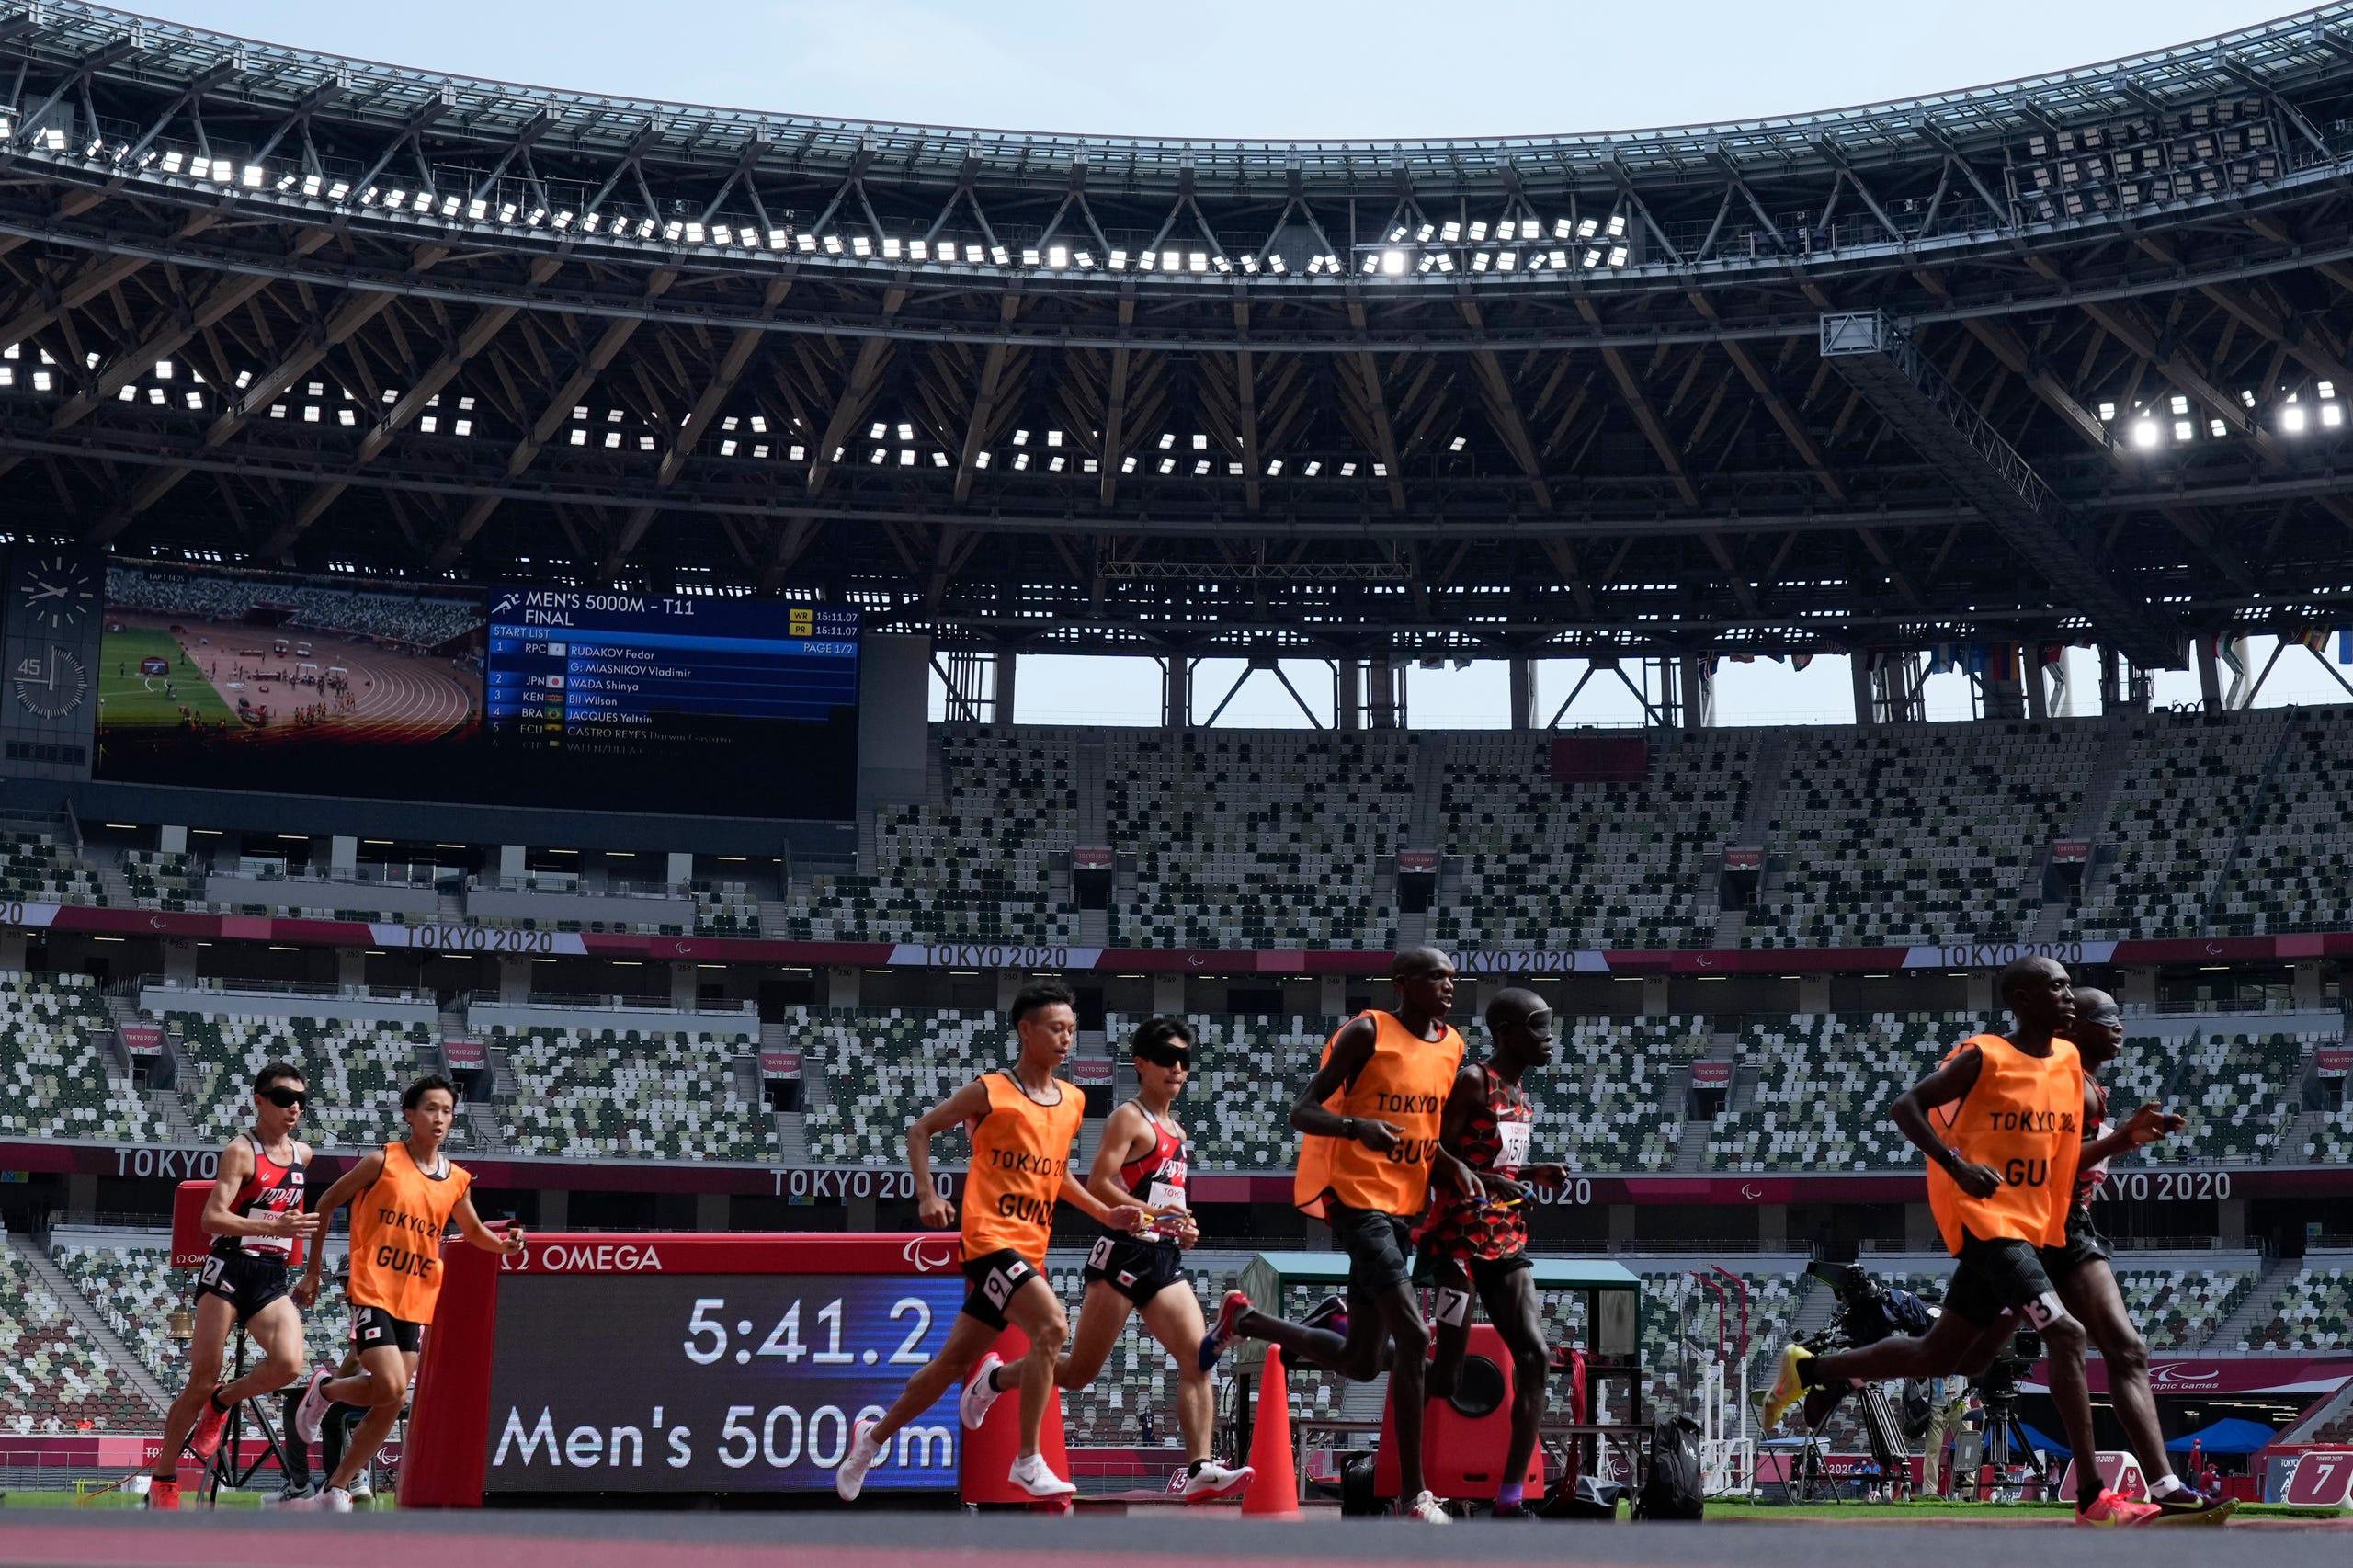 August 27, 2021: Rodgers Kiprop (third from right) of Kenya and Kenya Karasawa (center) of Japan compete during the men's 5000-meter run.